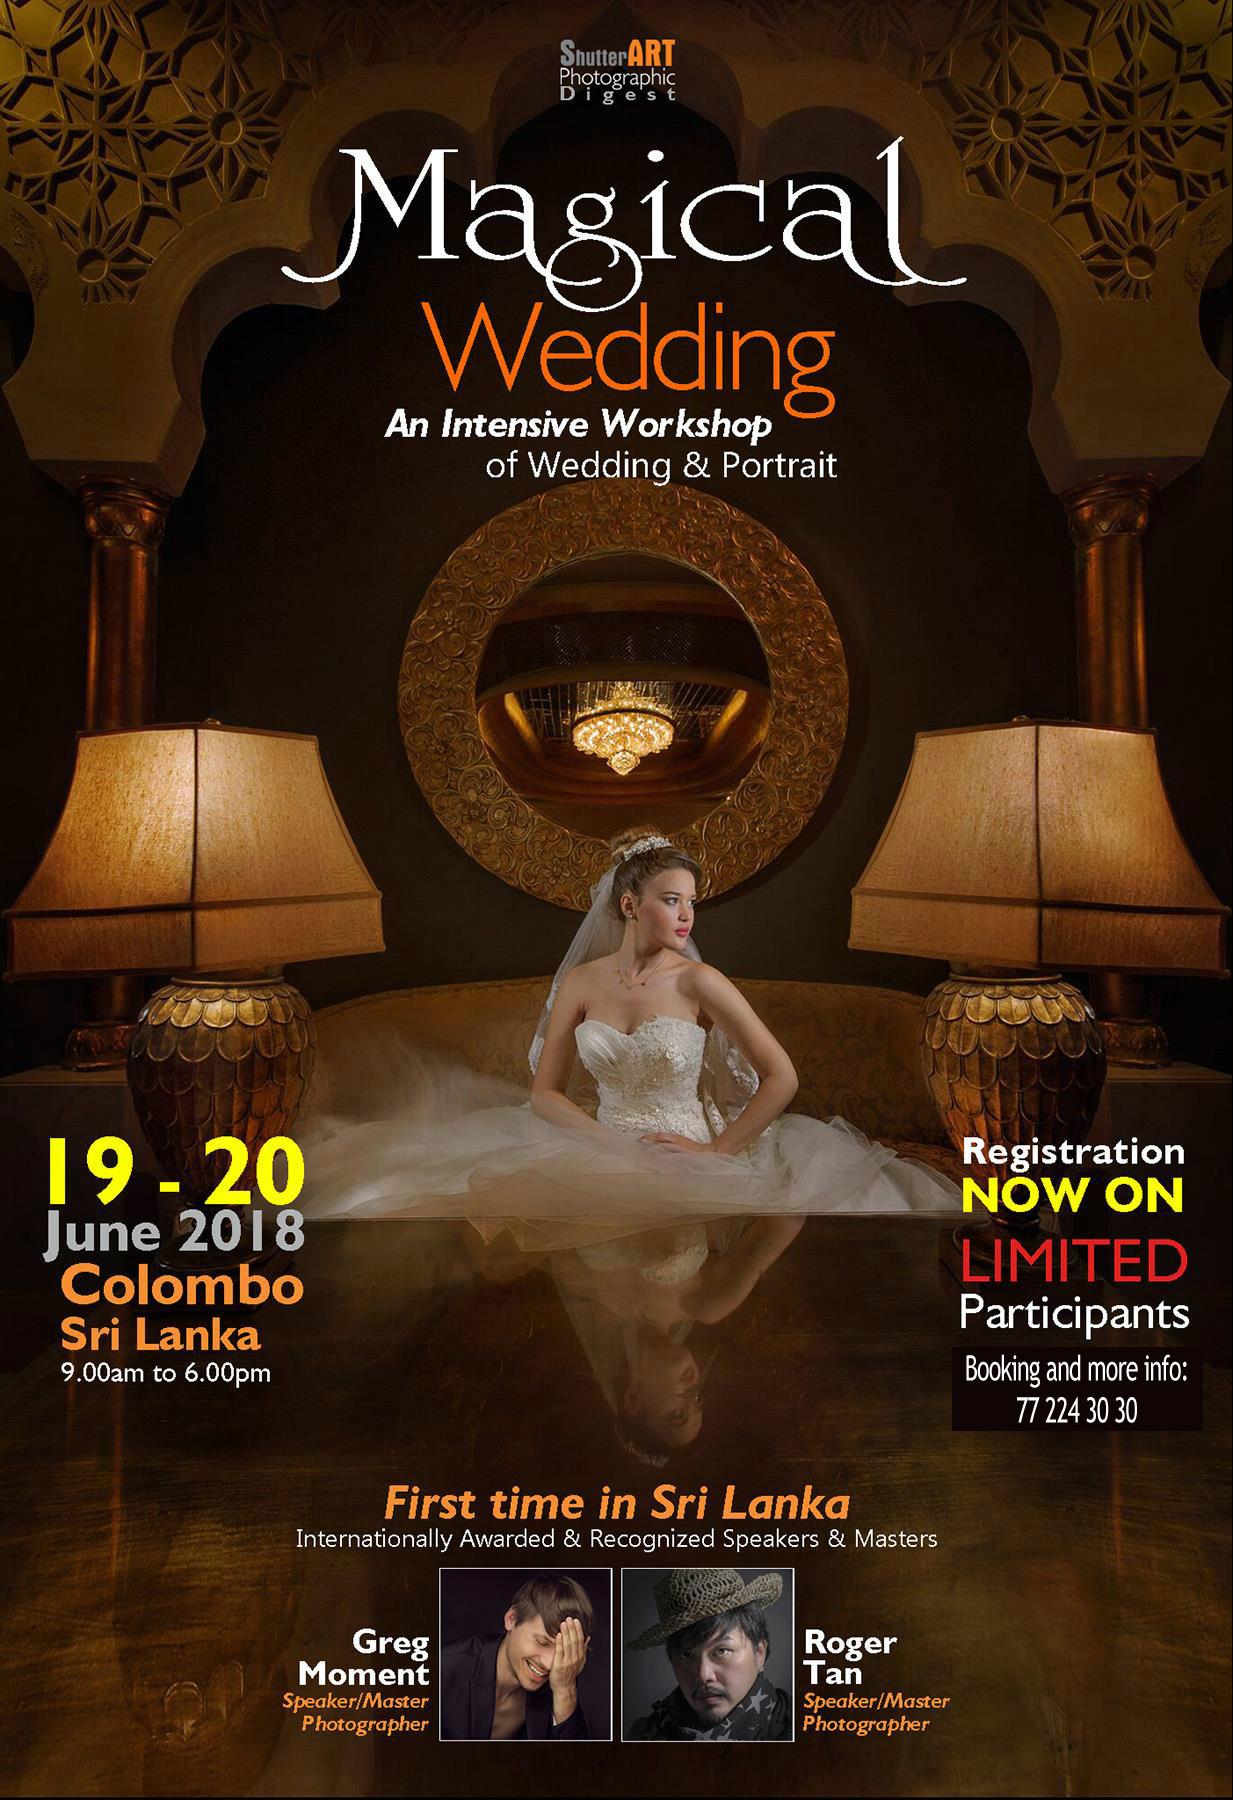 Colombo, Sri Lanka - 19/20.06.2018. with Roger Tan